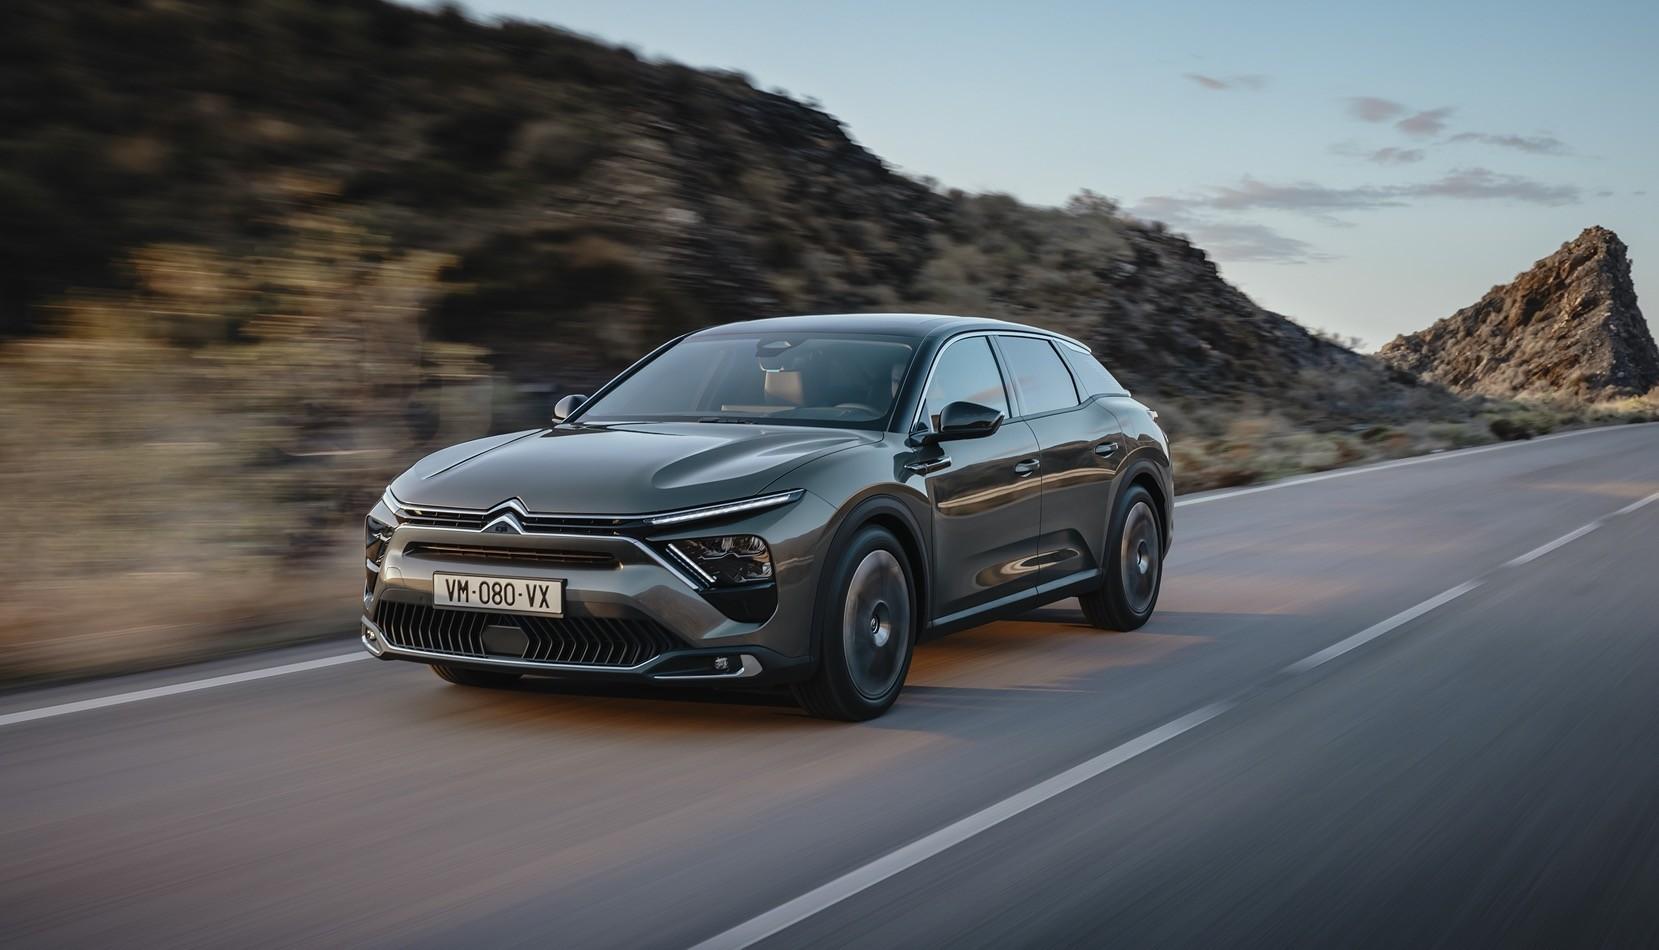 Nuova Citroën C5 X, ammiraglia à la francese